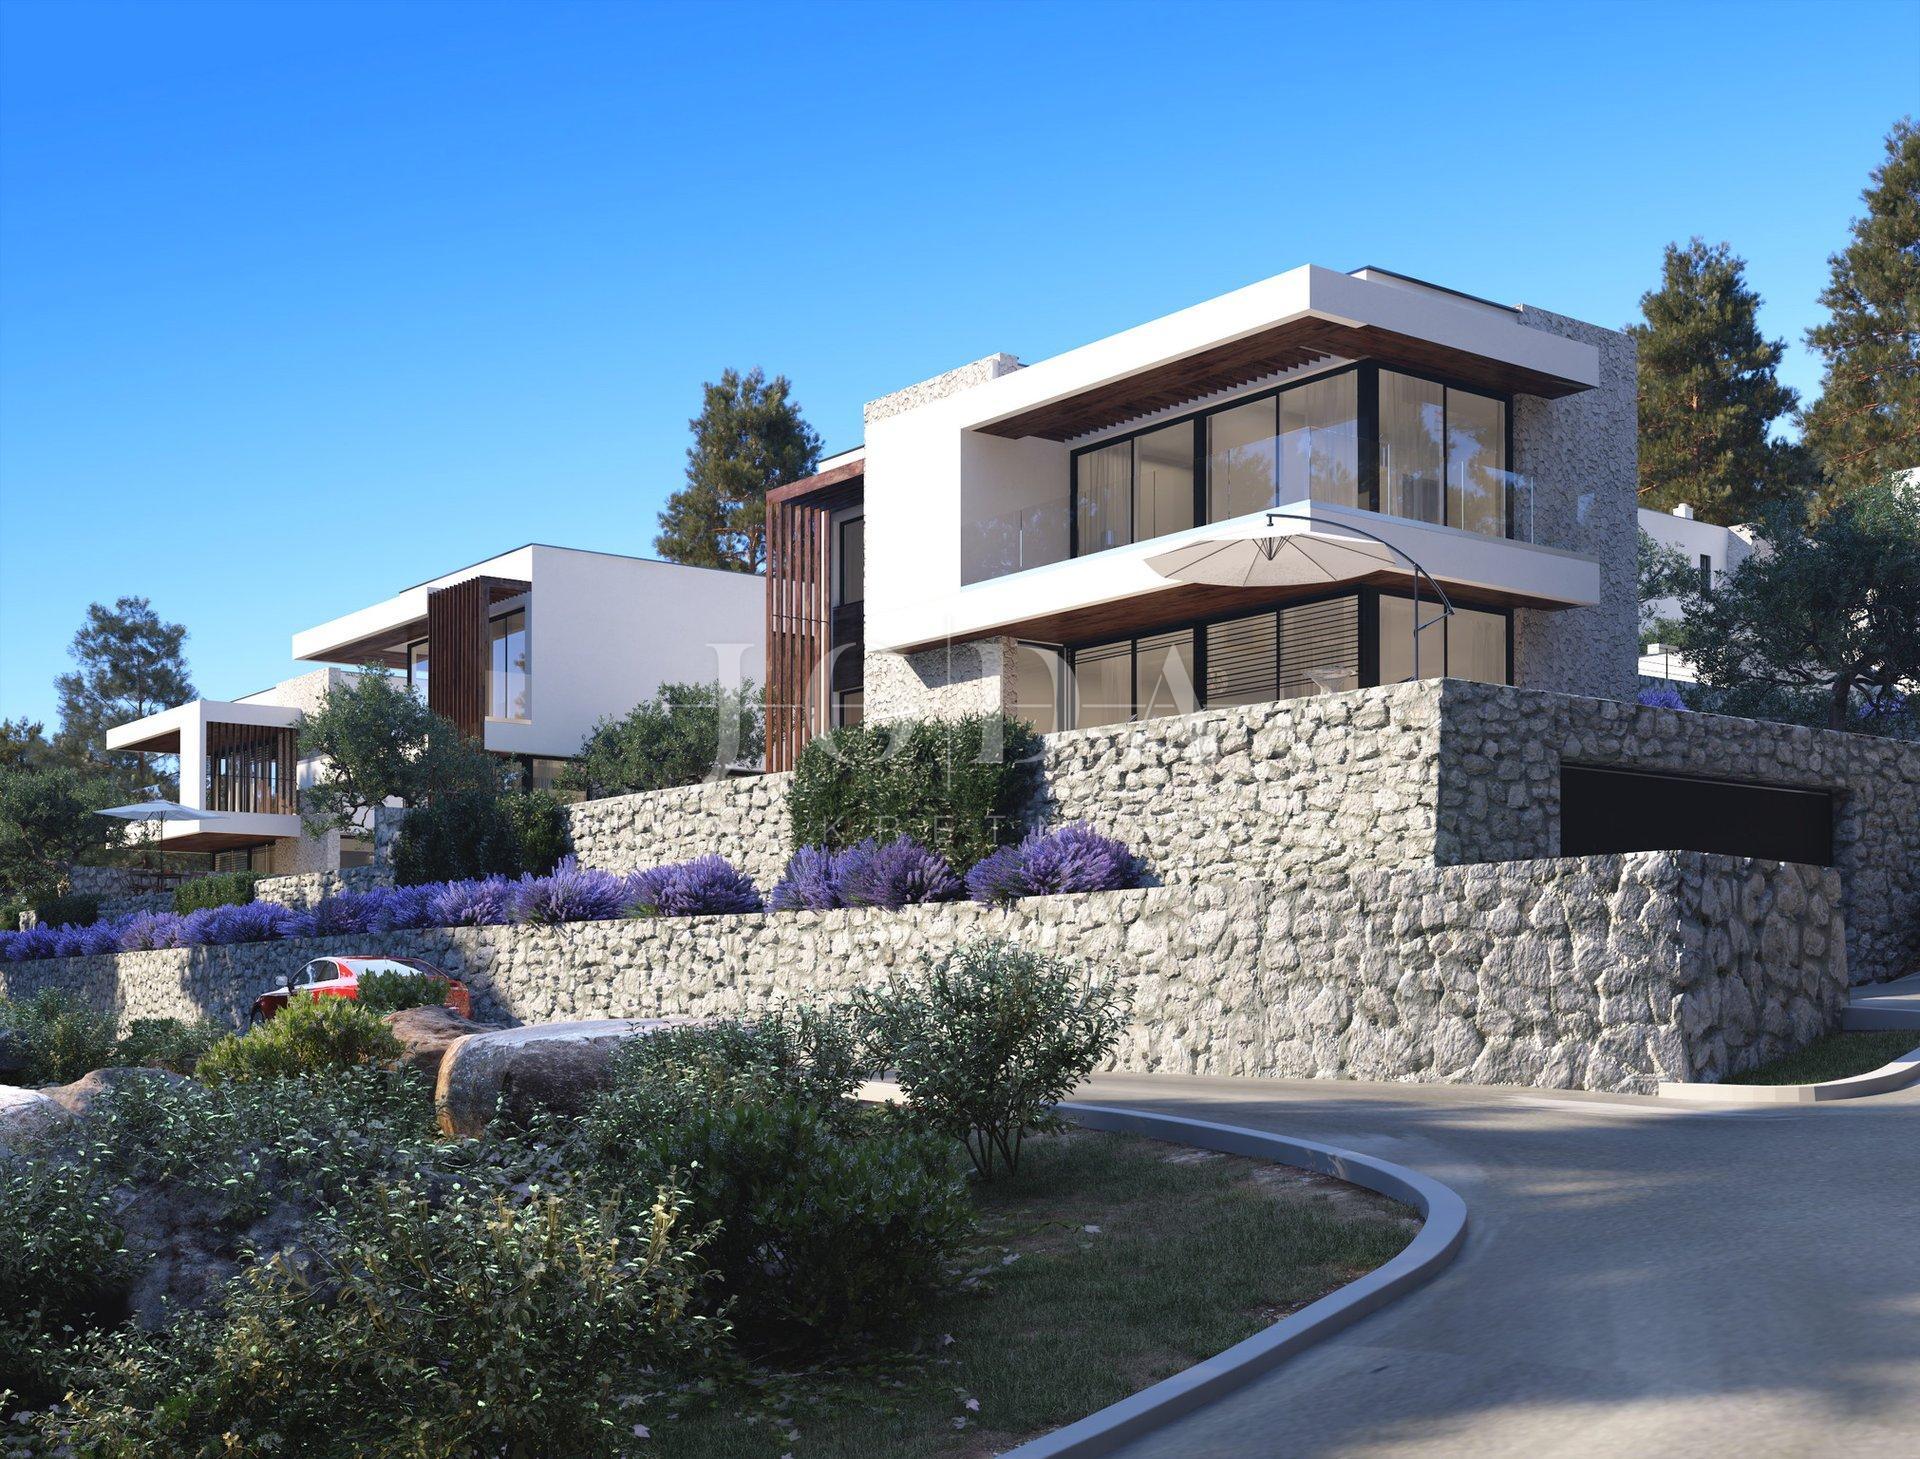 Crikvenica Olive Garden